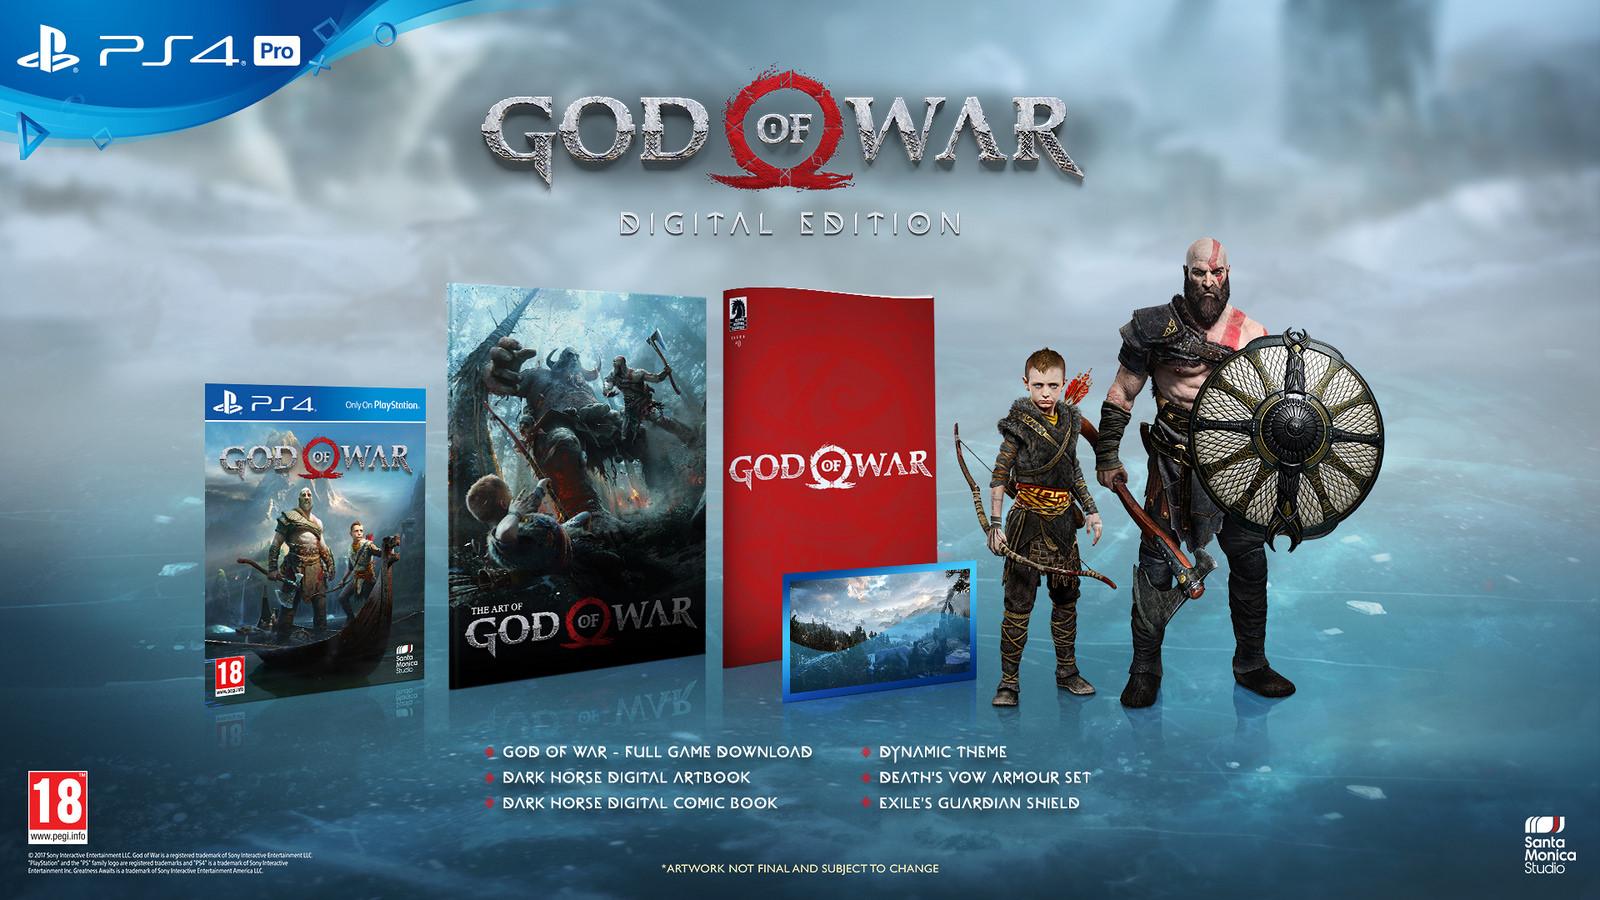 GodofWar PS4 Div 042